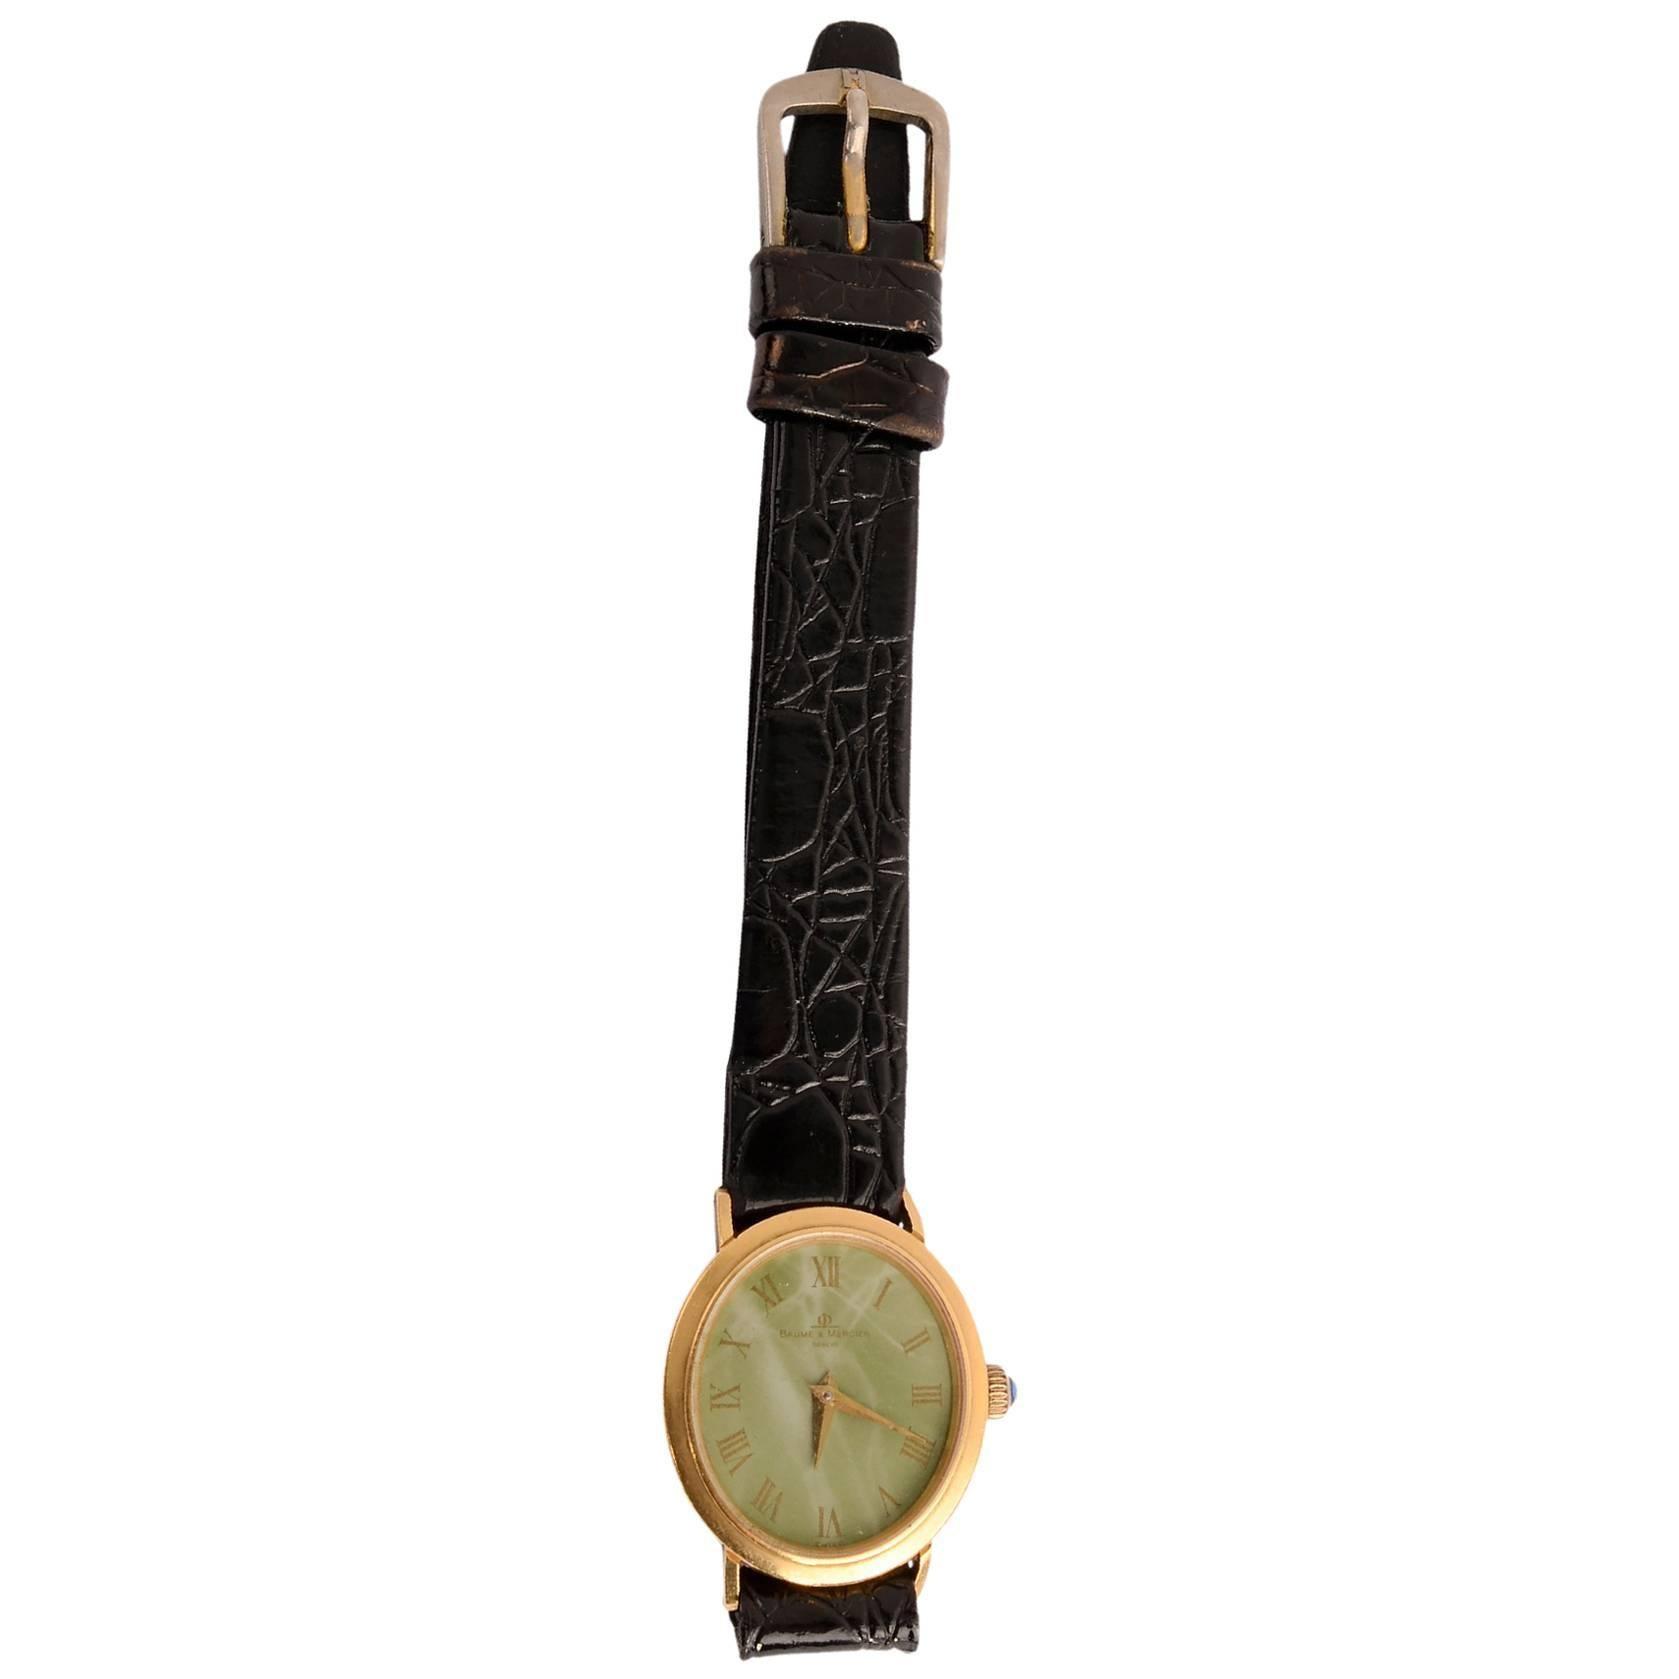 Baume & Mercier Ladies Yellow Gold Manual Wristwatch